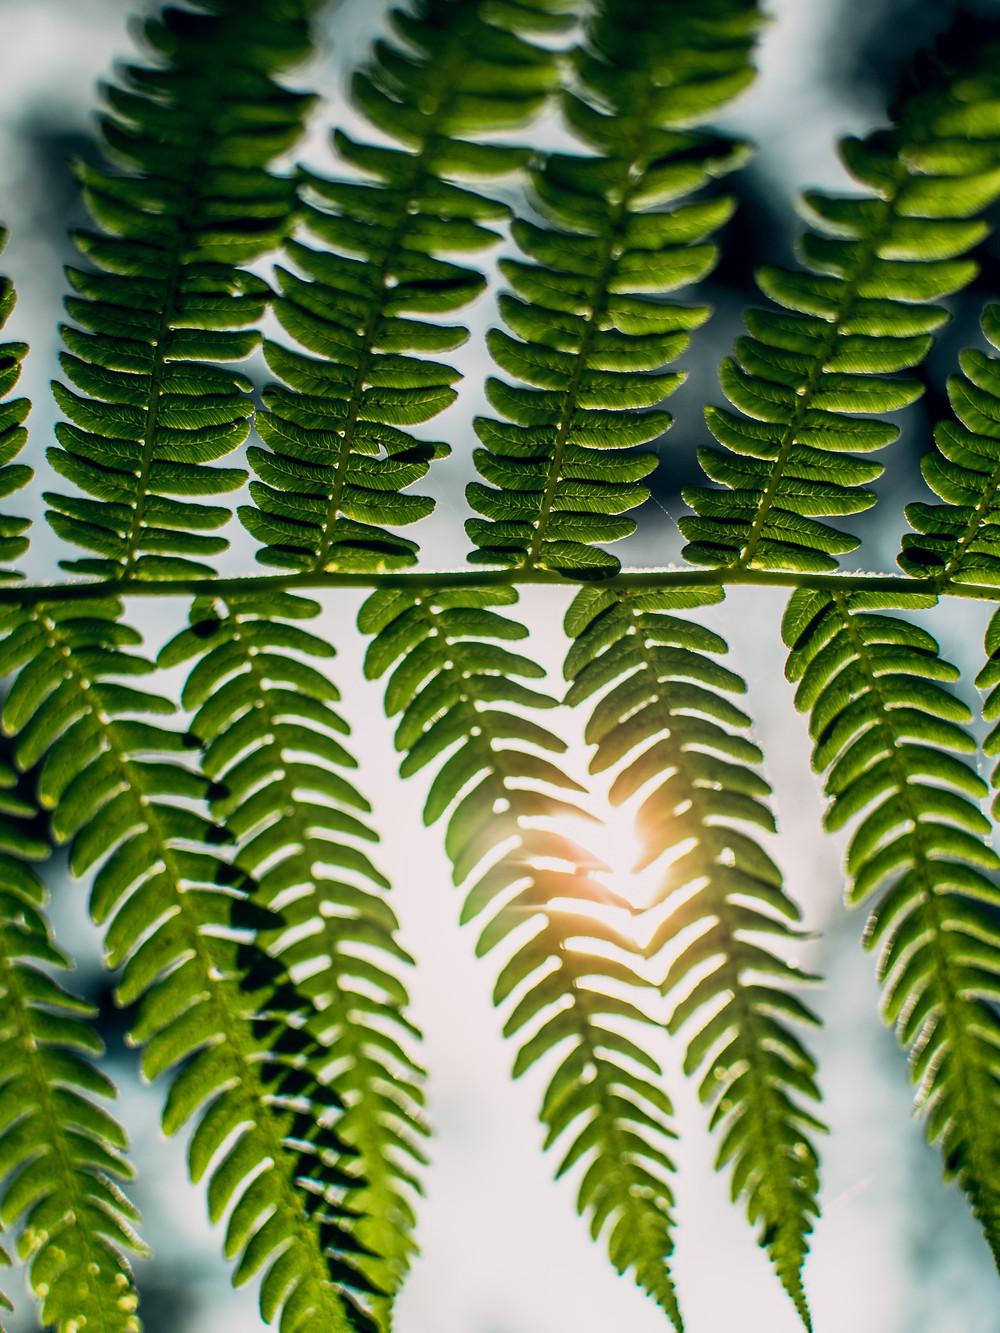 Sunlight shining through ferns